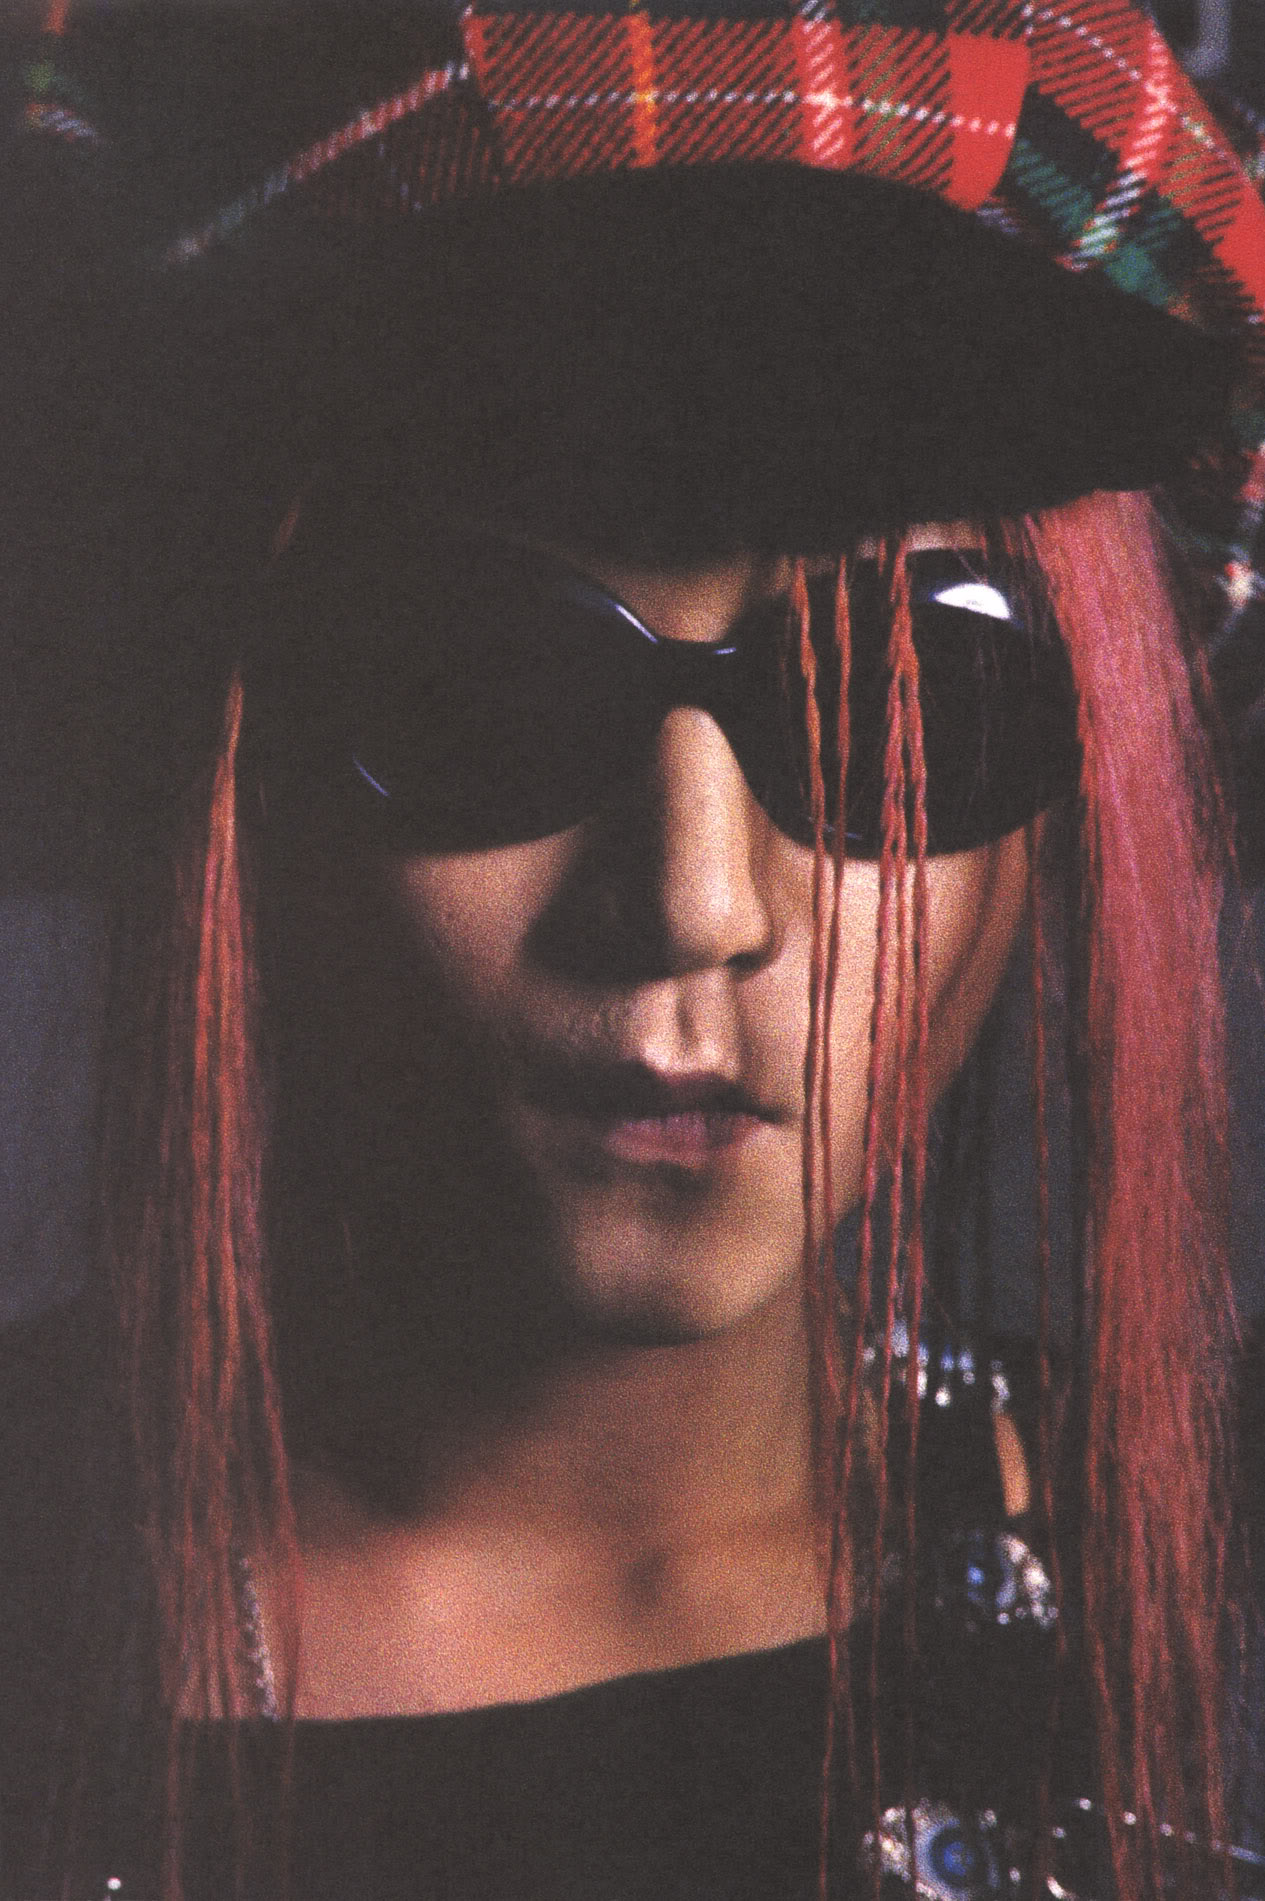 Hide X Japan - Страница 2 Oth12-hc-11